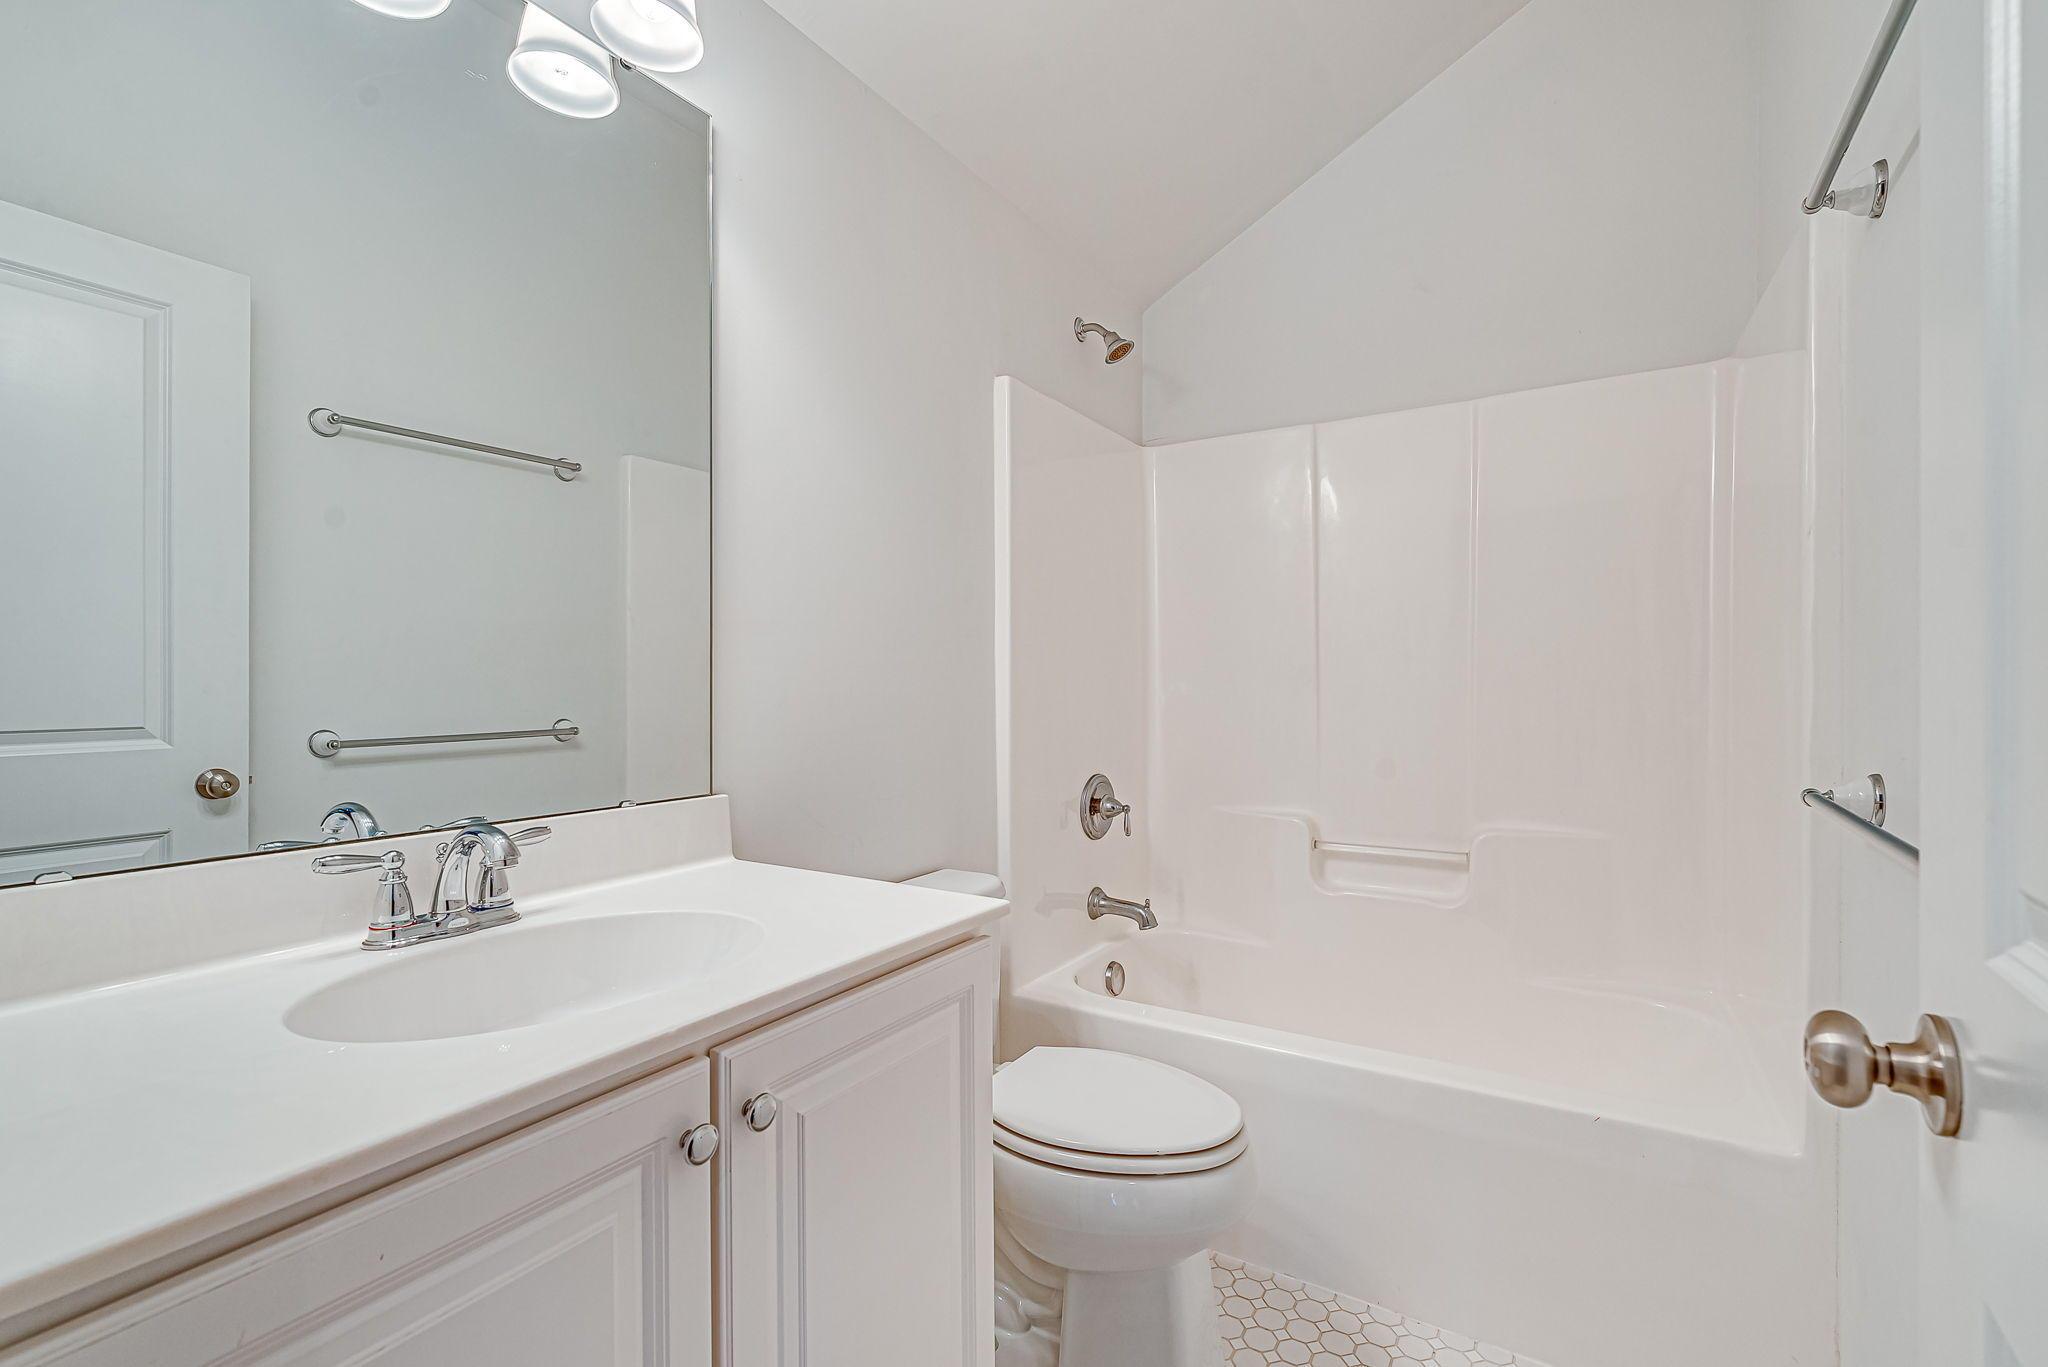 Dunes West Homes For Sale - 2476 Kings Gate, Mount Pleasant, SC - 30